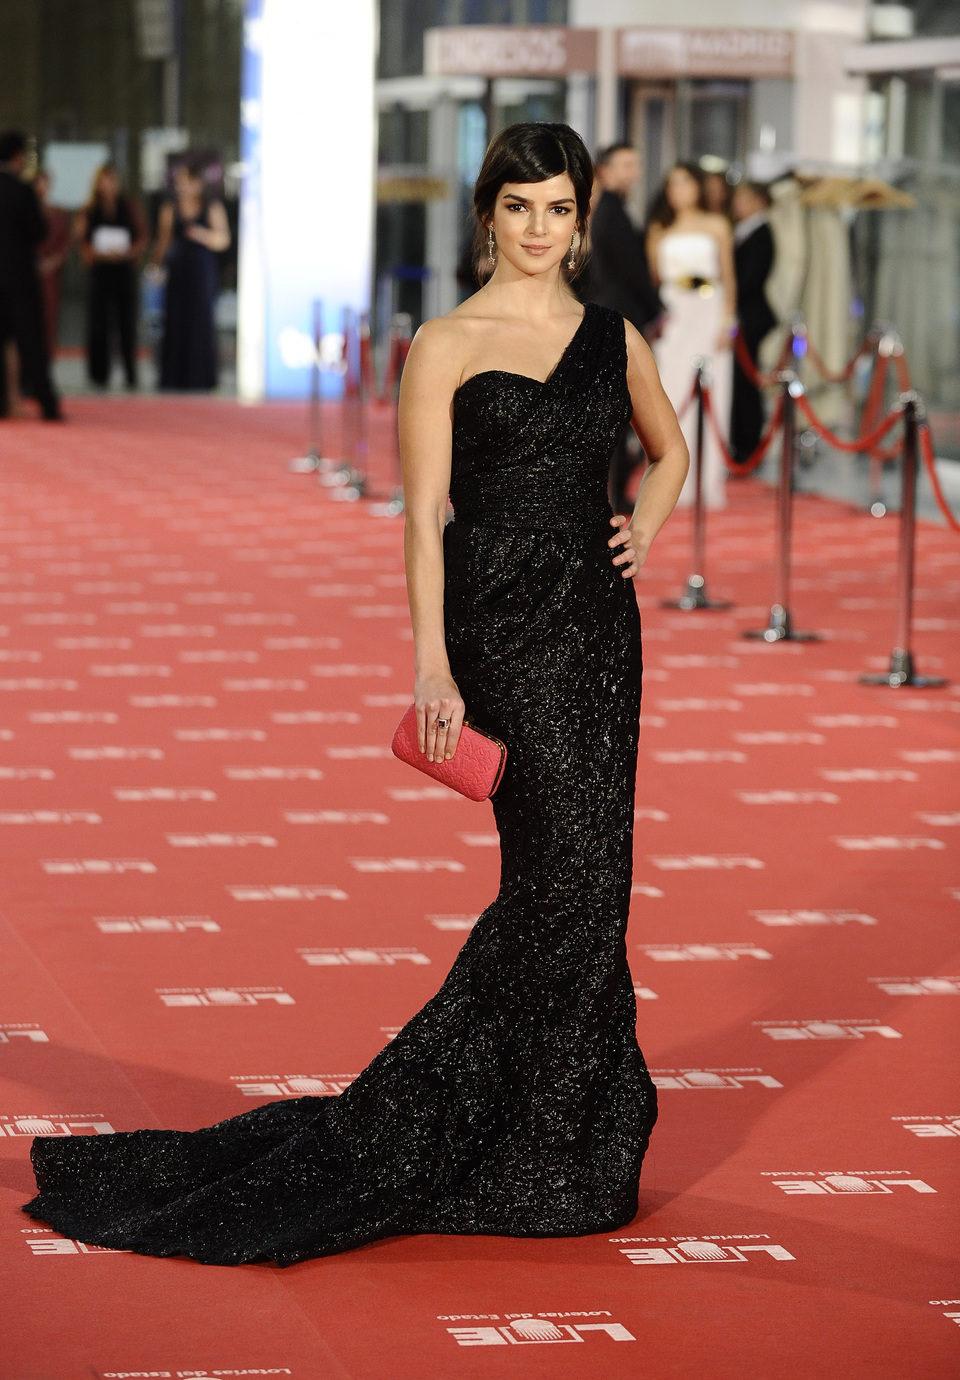 Clara Lago cruza la alfombra roja de los Goya 2012